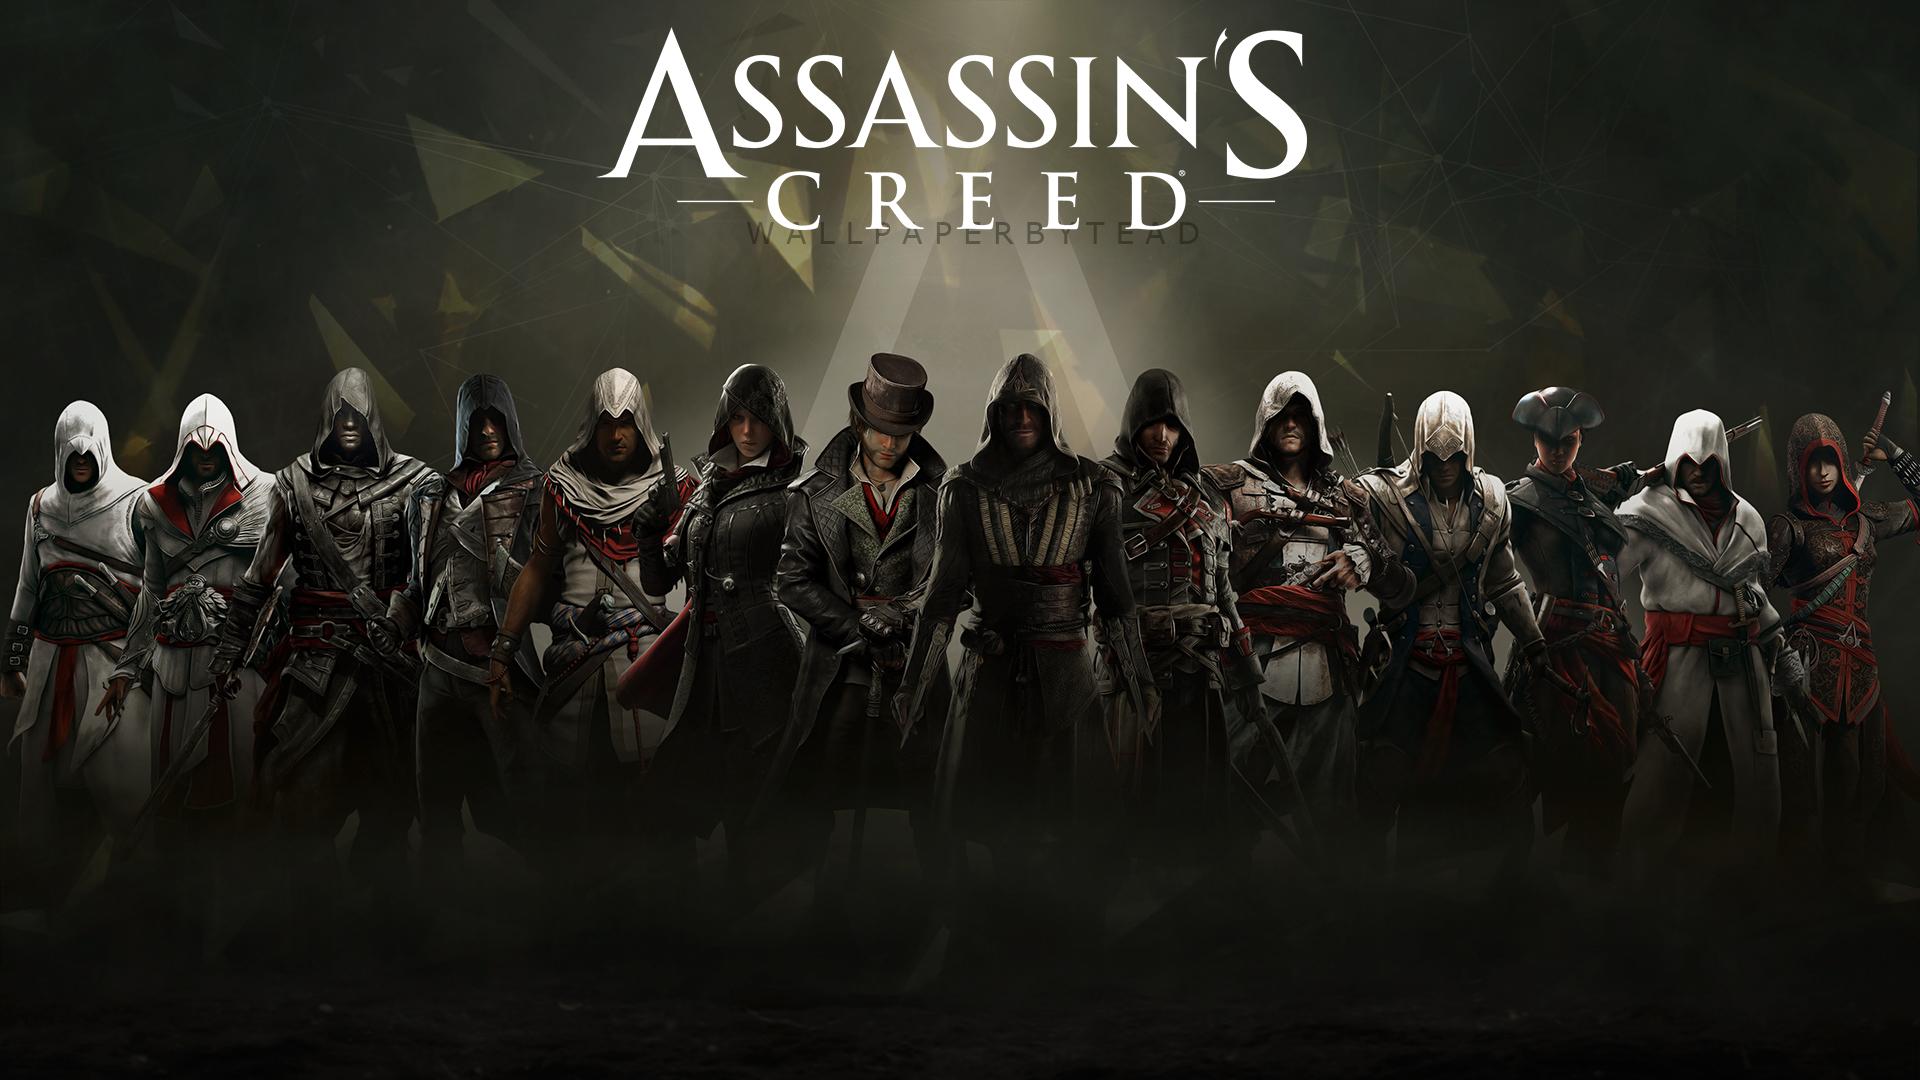 Assassin 39 s creed hd wallpaper 6 by tead by santap555 on deviantart - Assasins wallpaper ...